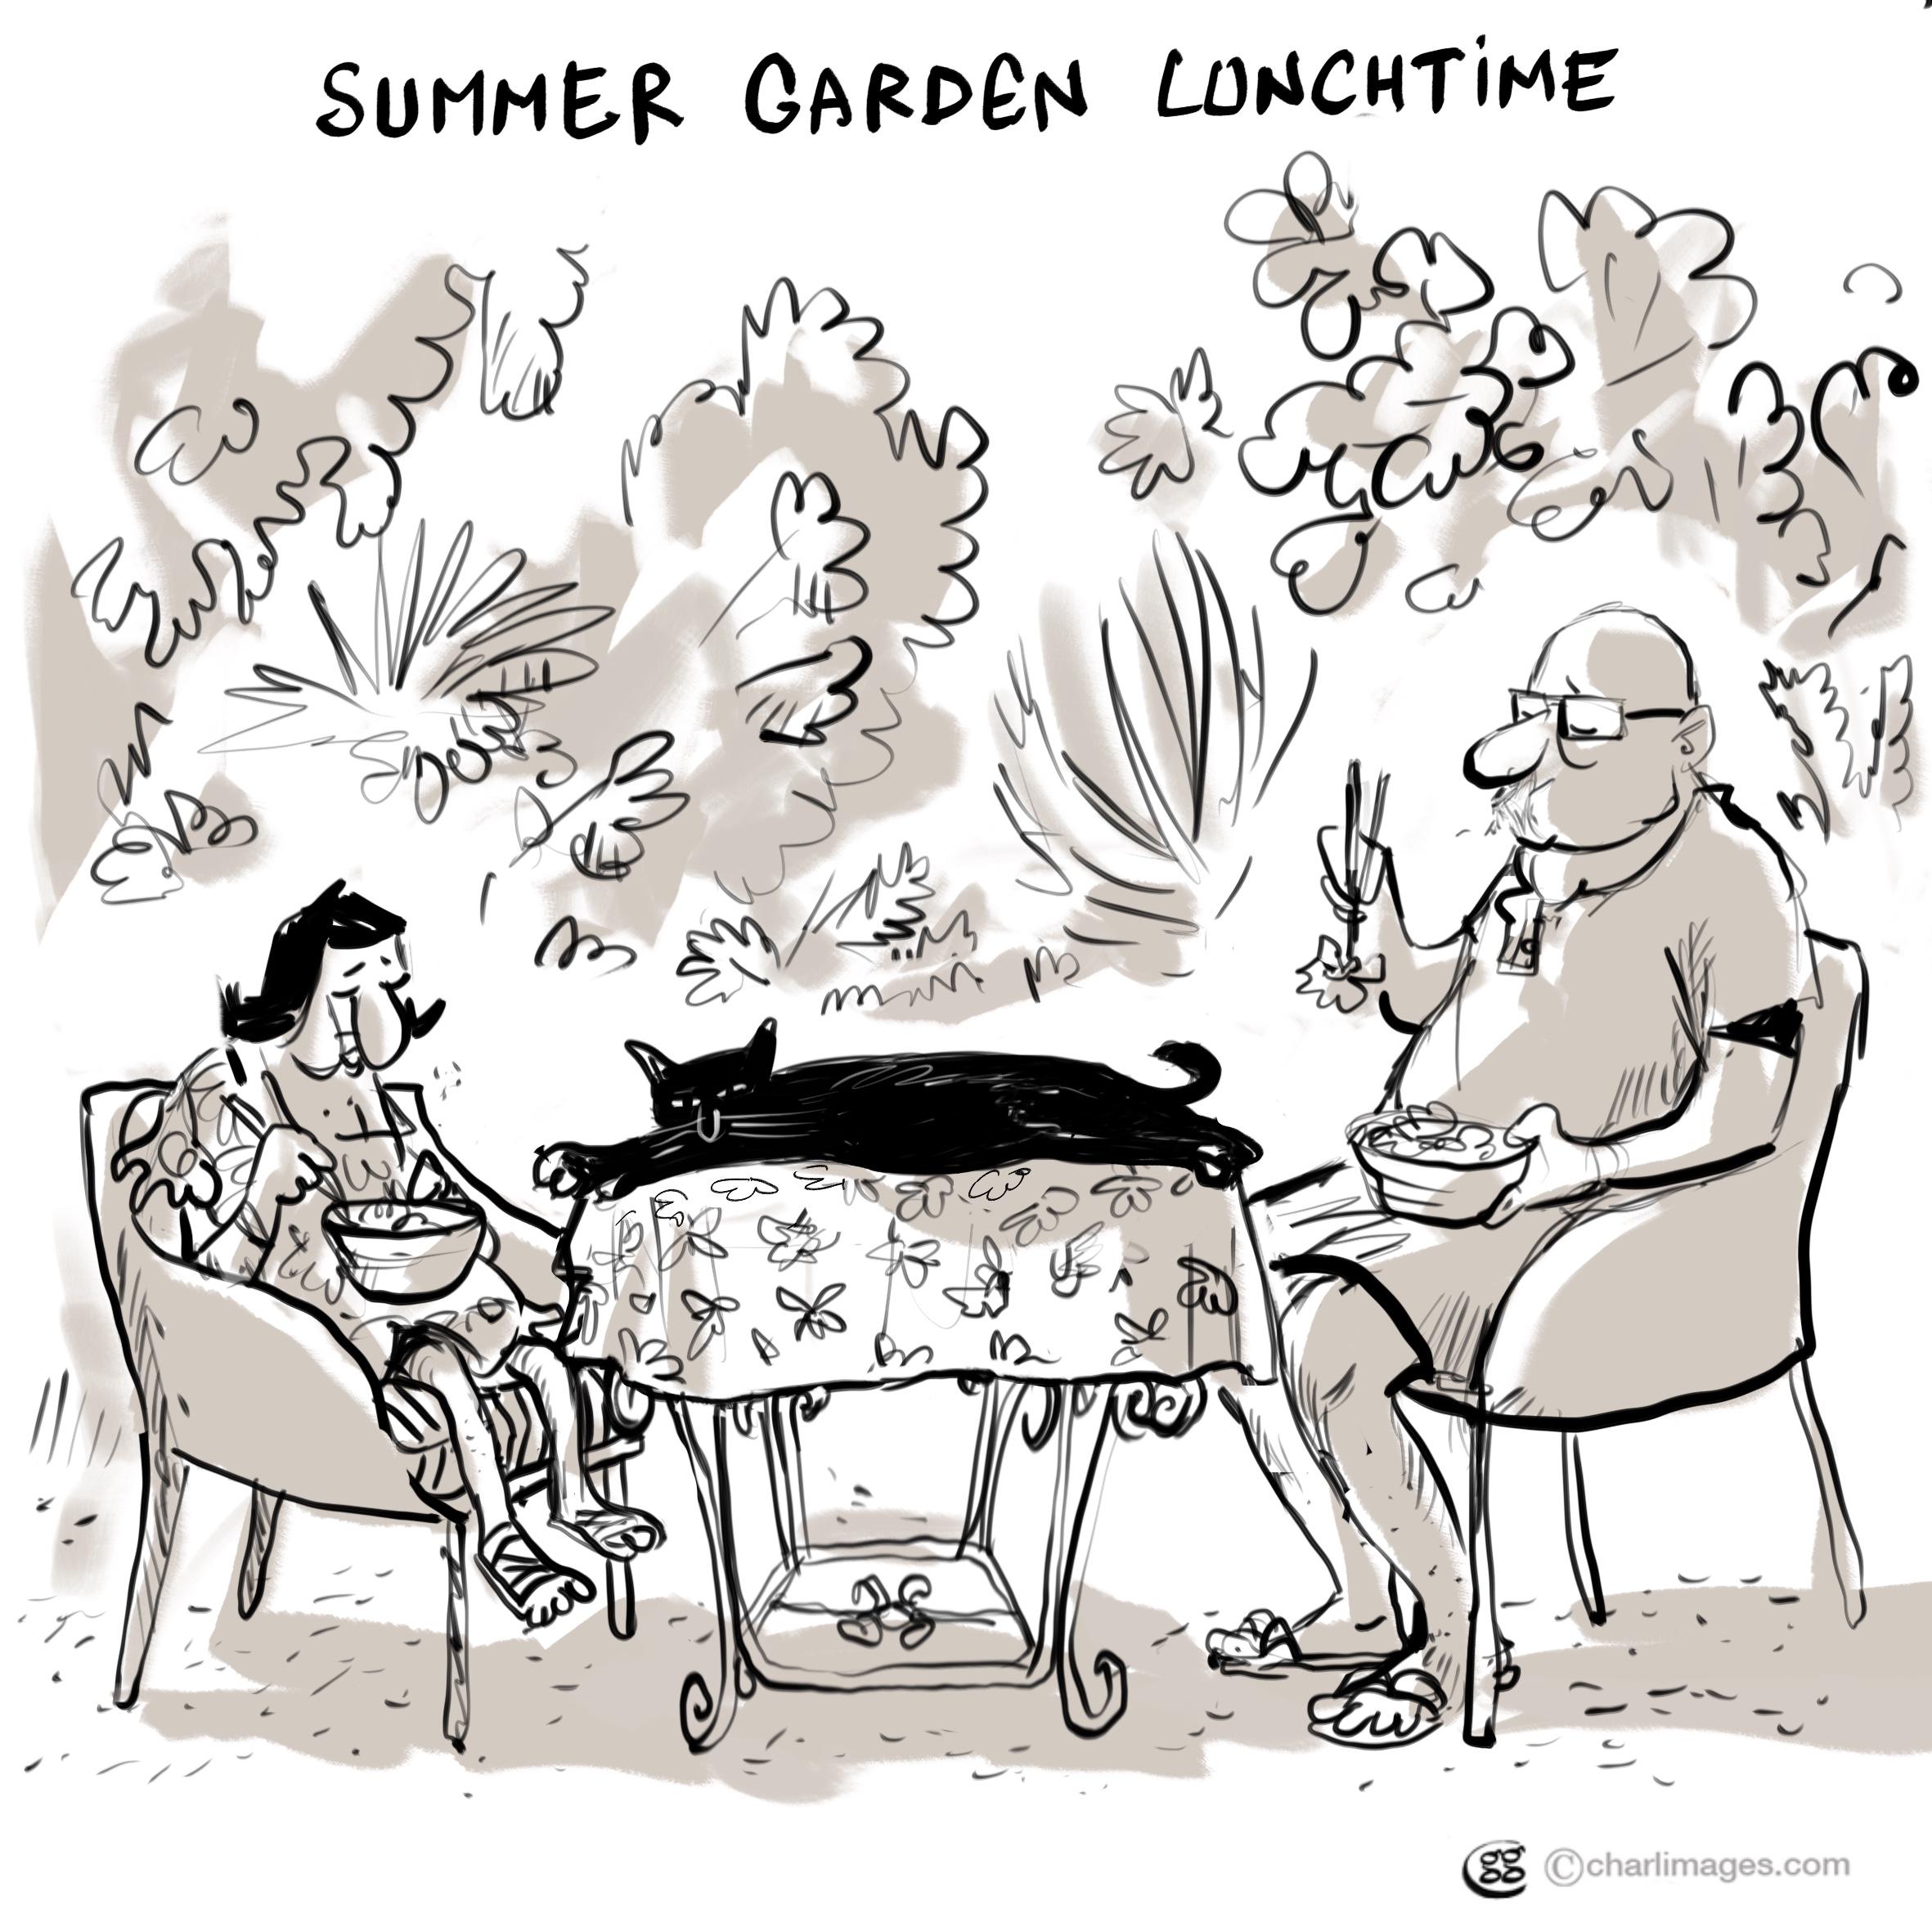 Summer garden lunchtime